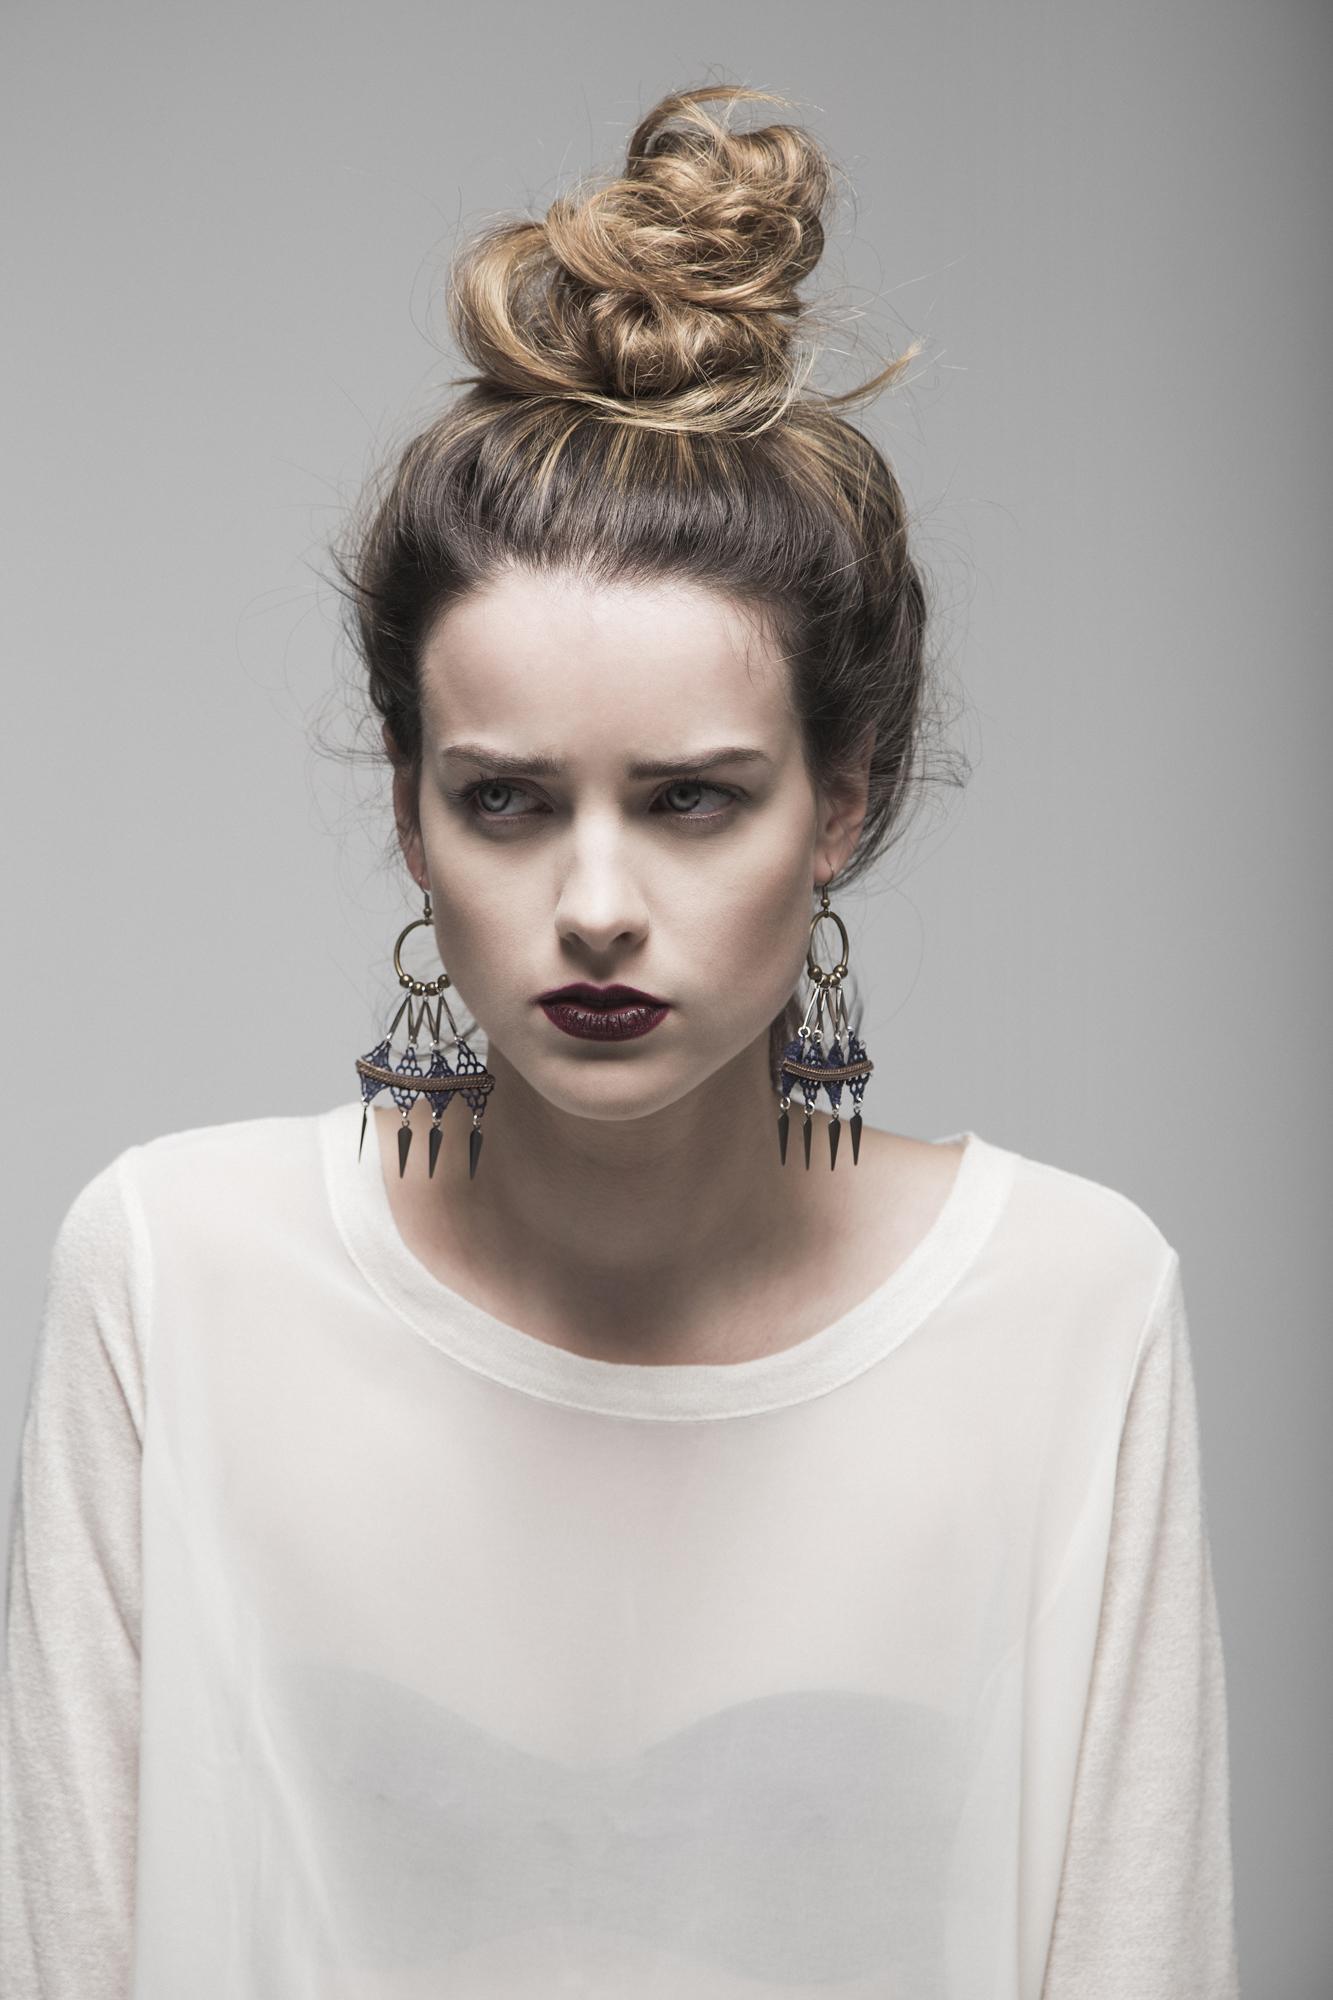 Array earrings (details here)